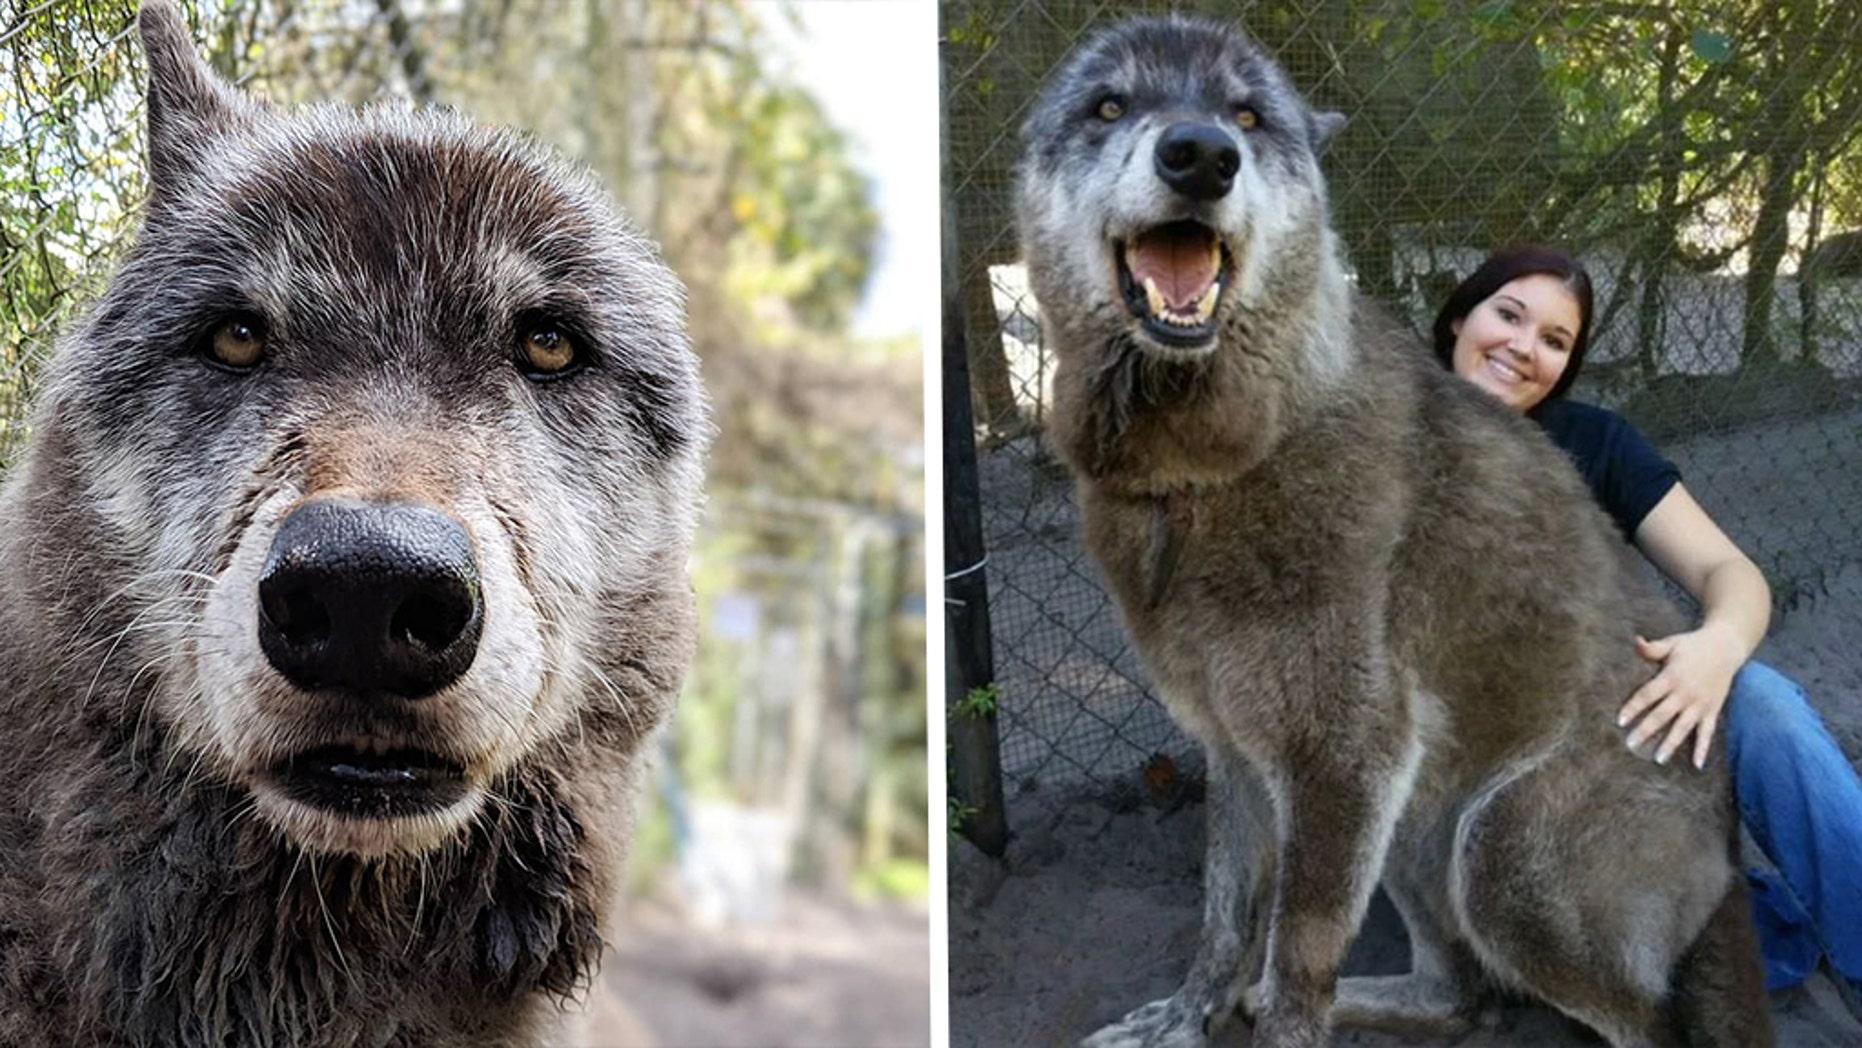 Yuki, a wolfdog hybrid, was rescued by the Shy Wolf Sanctuary in 2008.